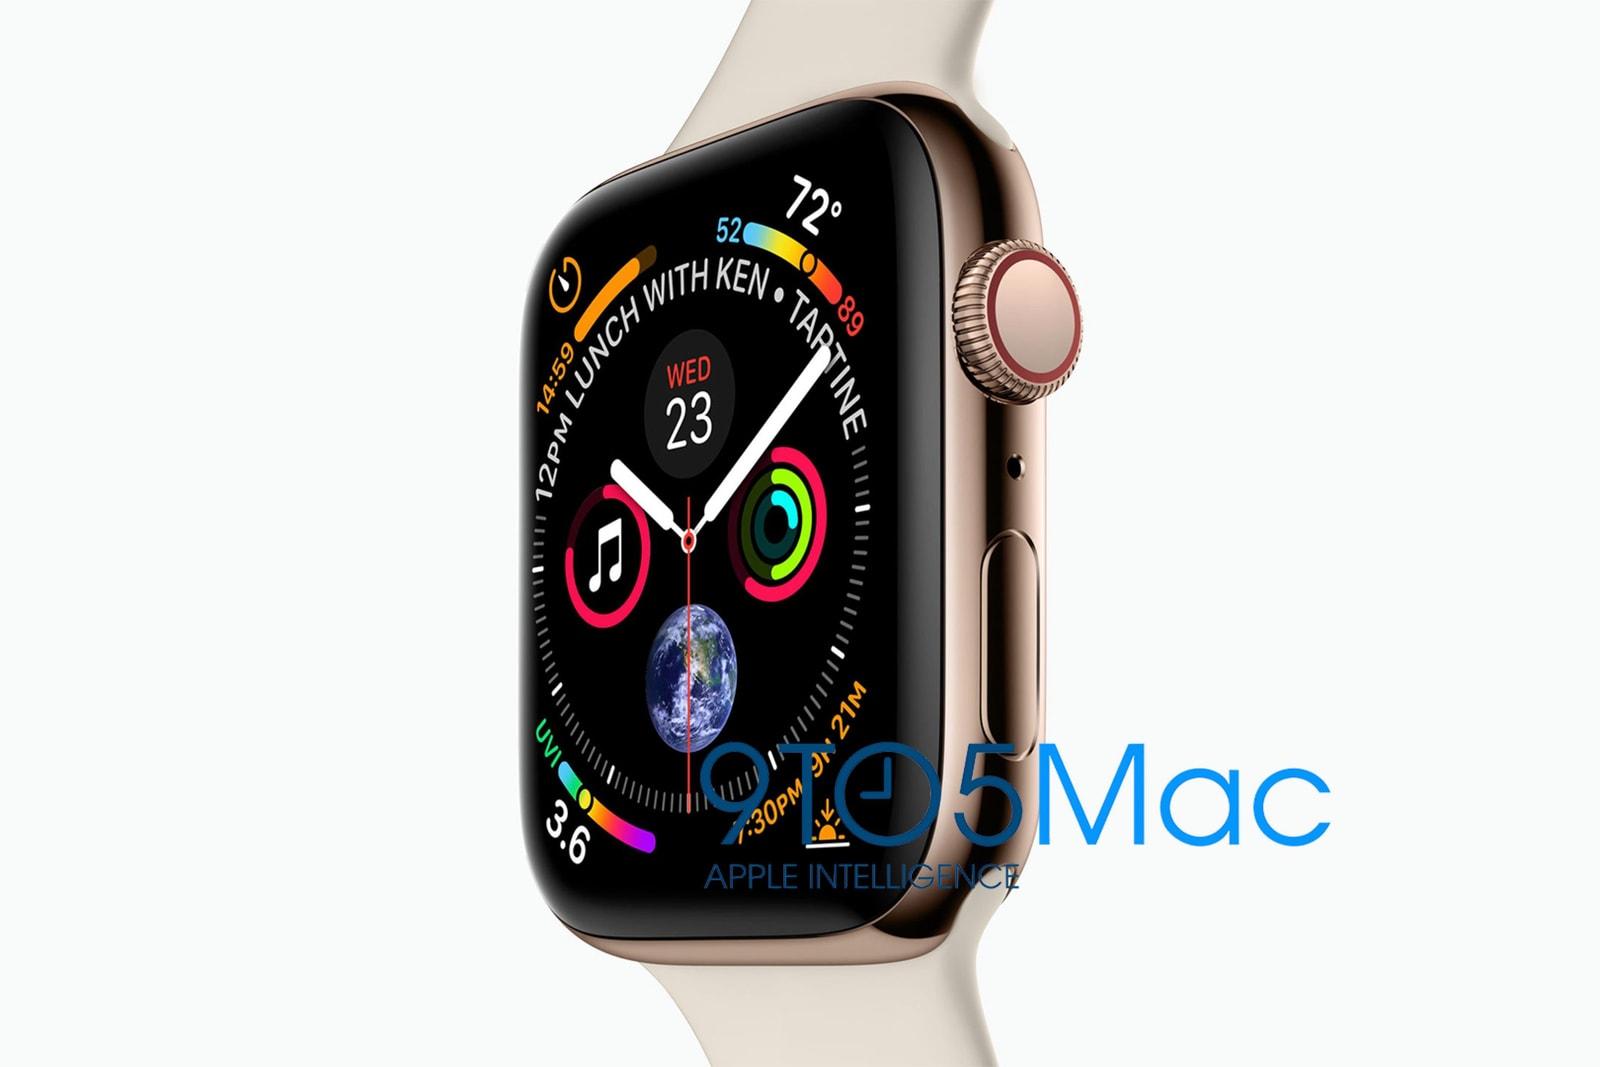 Apple 發佈會前瞻-官方照片洩露確認 iPhone 將提供金色選項